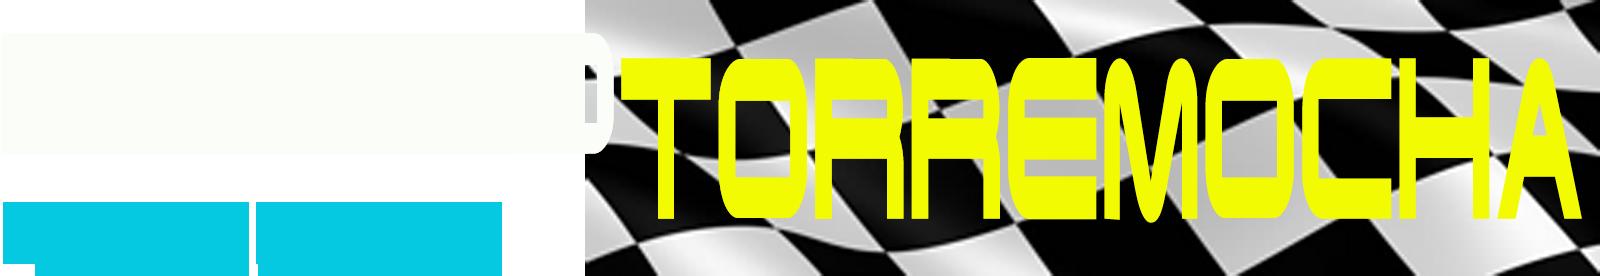 Karting Torremocha Del Jiloca | Karting y Paintball en Teruel